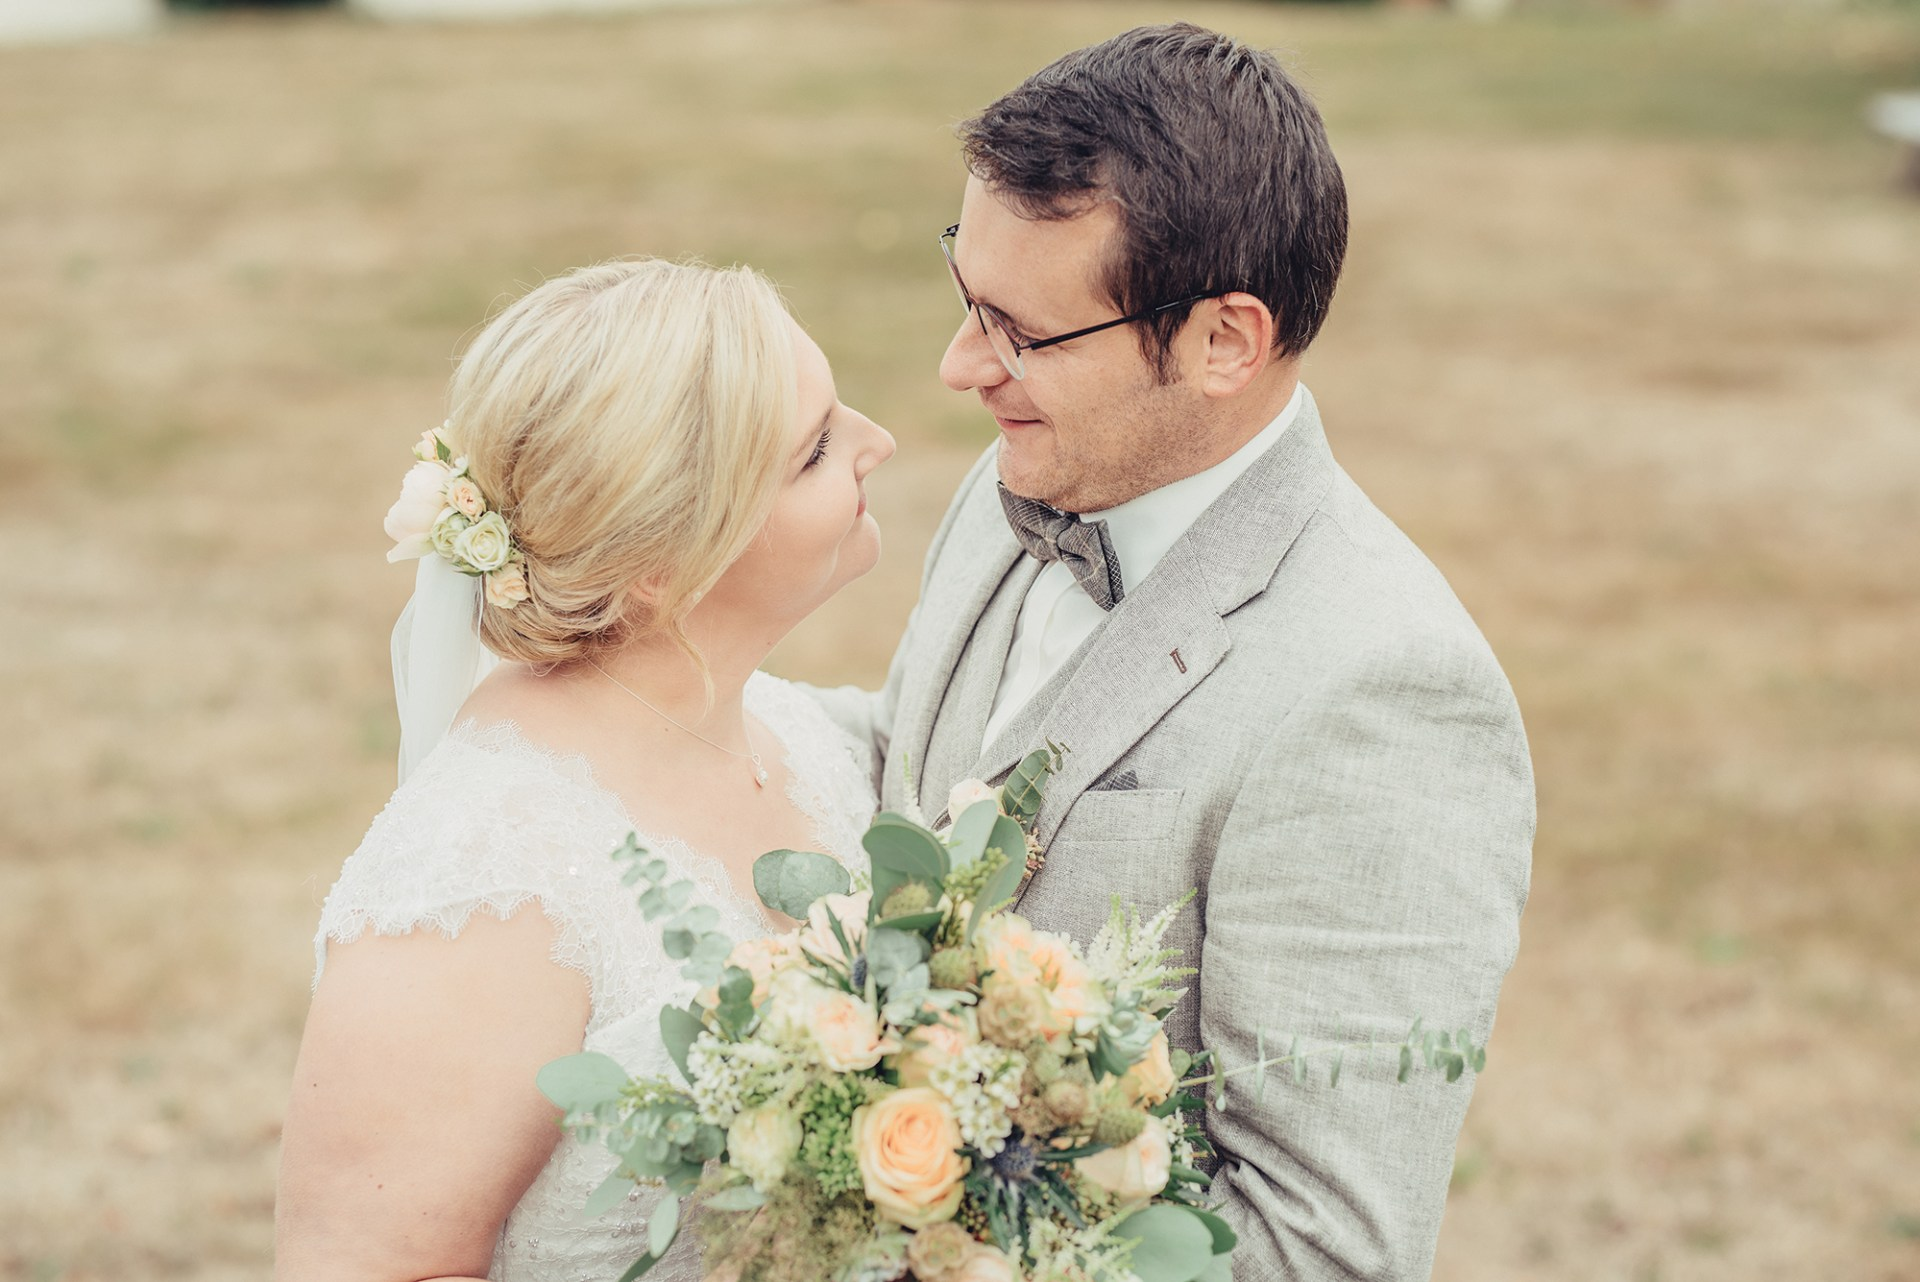 weddingseptemberluminoxx92348234152